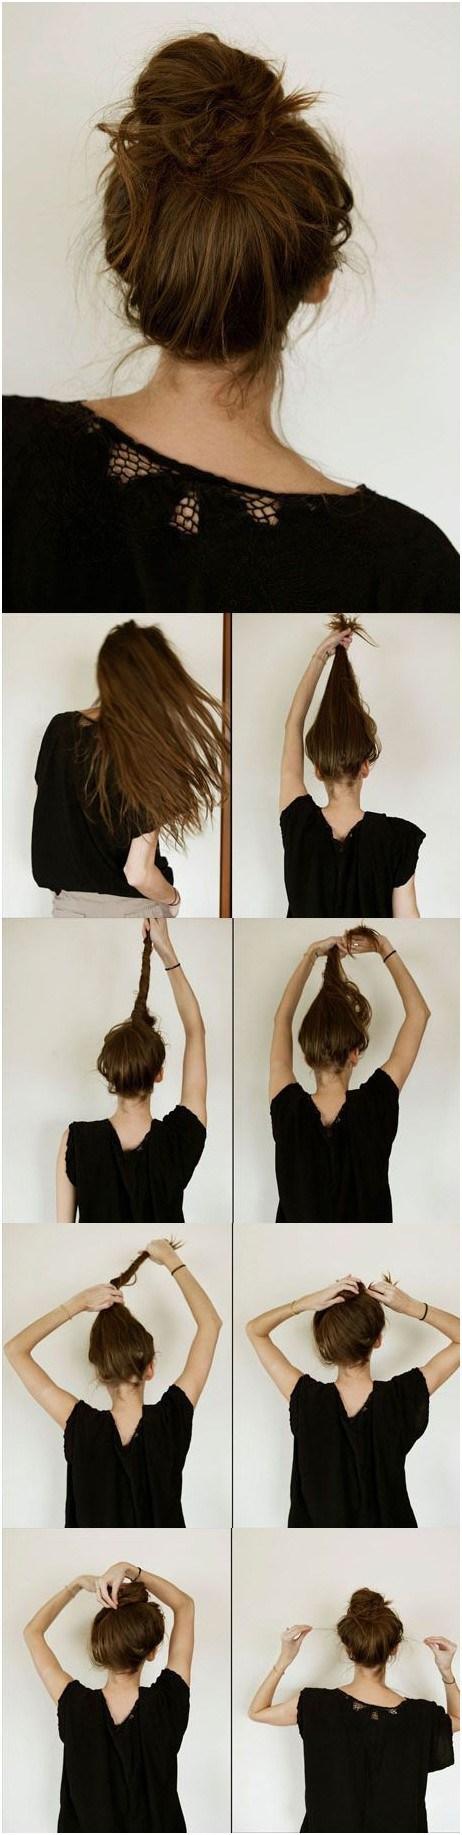 20 Easy Elegant Step-by-Step Hair Tutorials for Long & Medium Hair